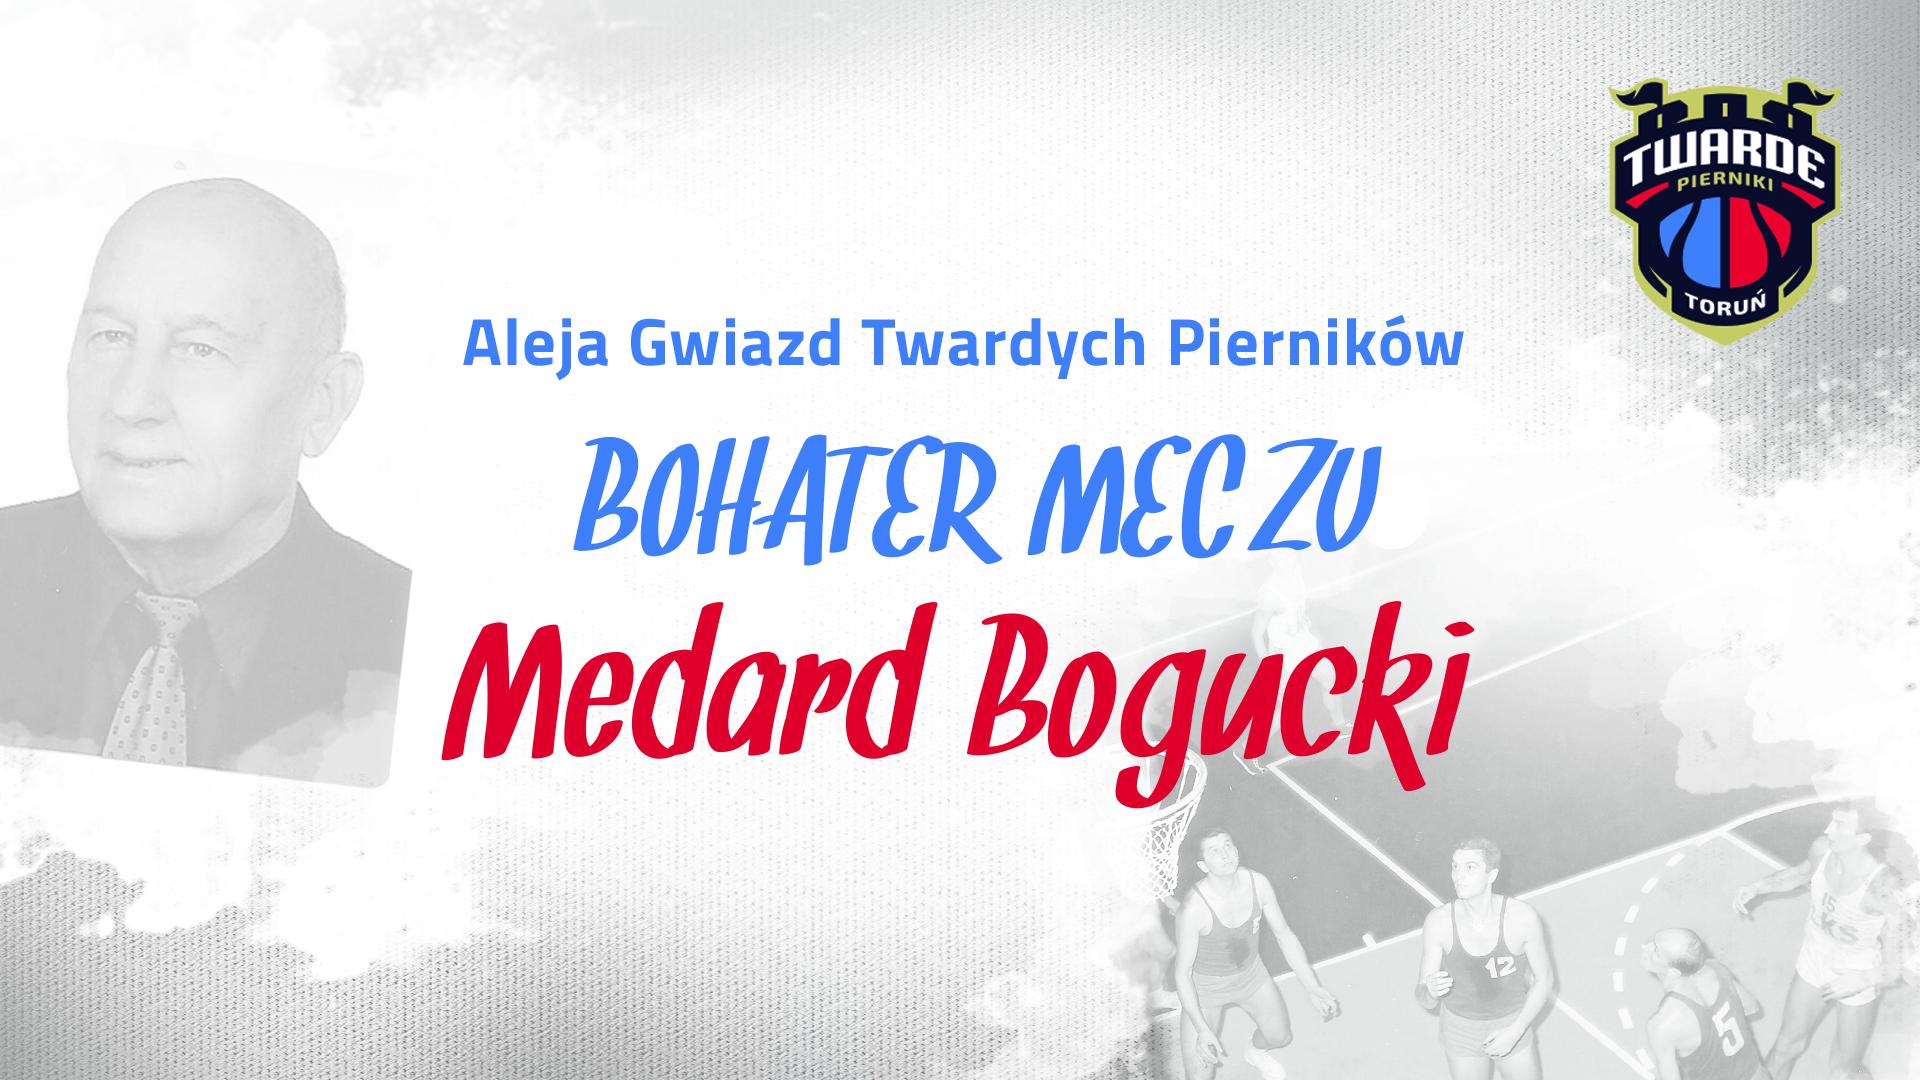 Dyplom dla Medarda Boguckiego_HD